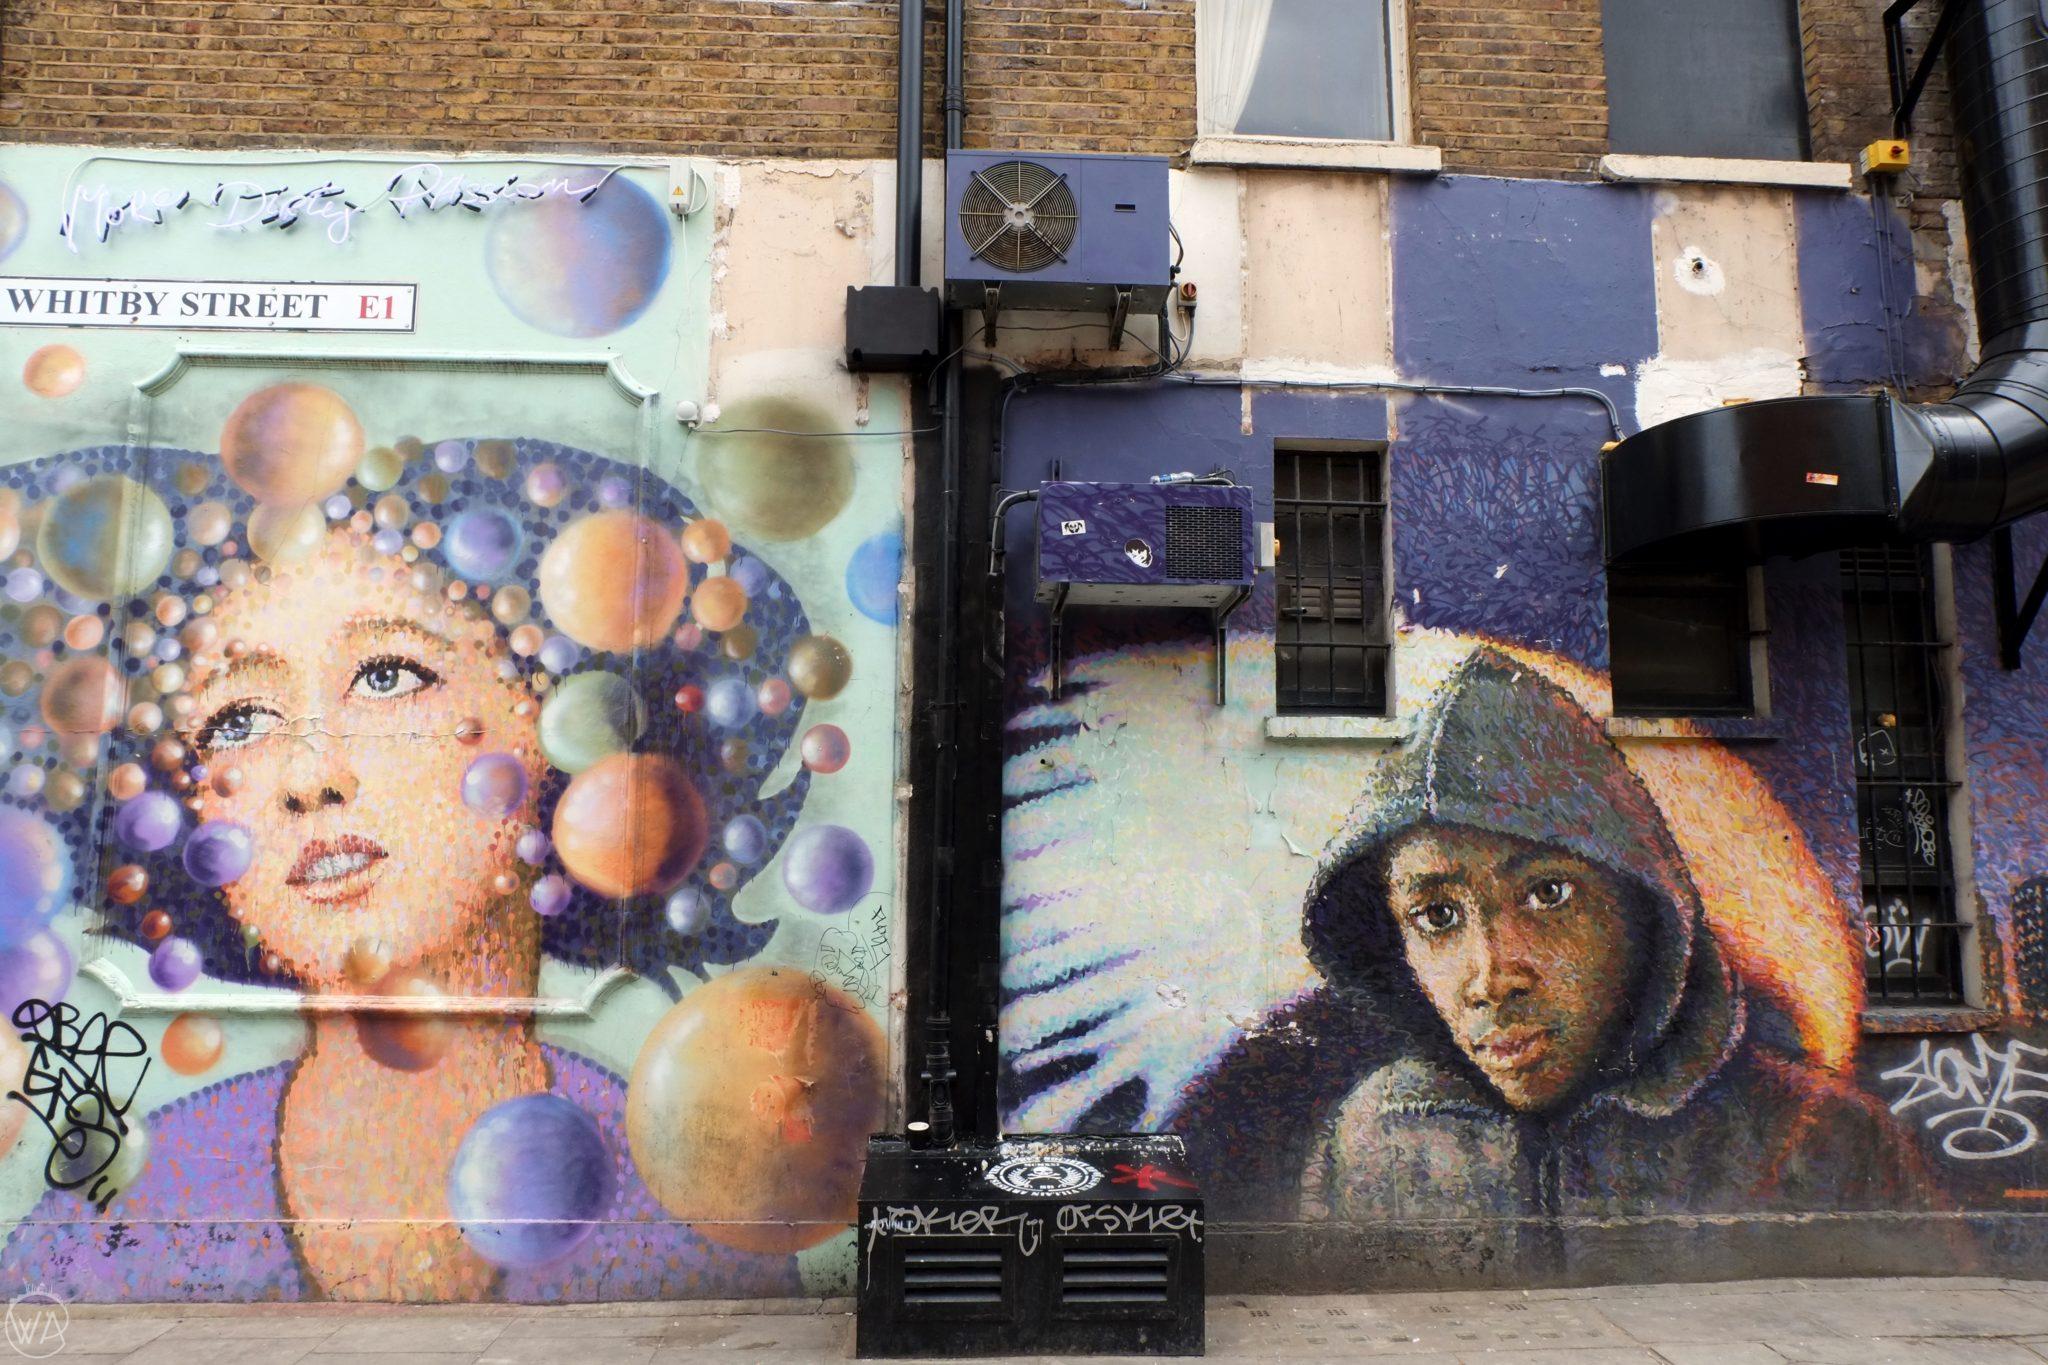 Street art of a woman and boy, brick lane, London